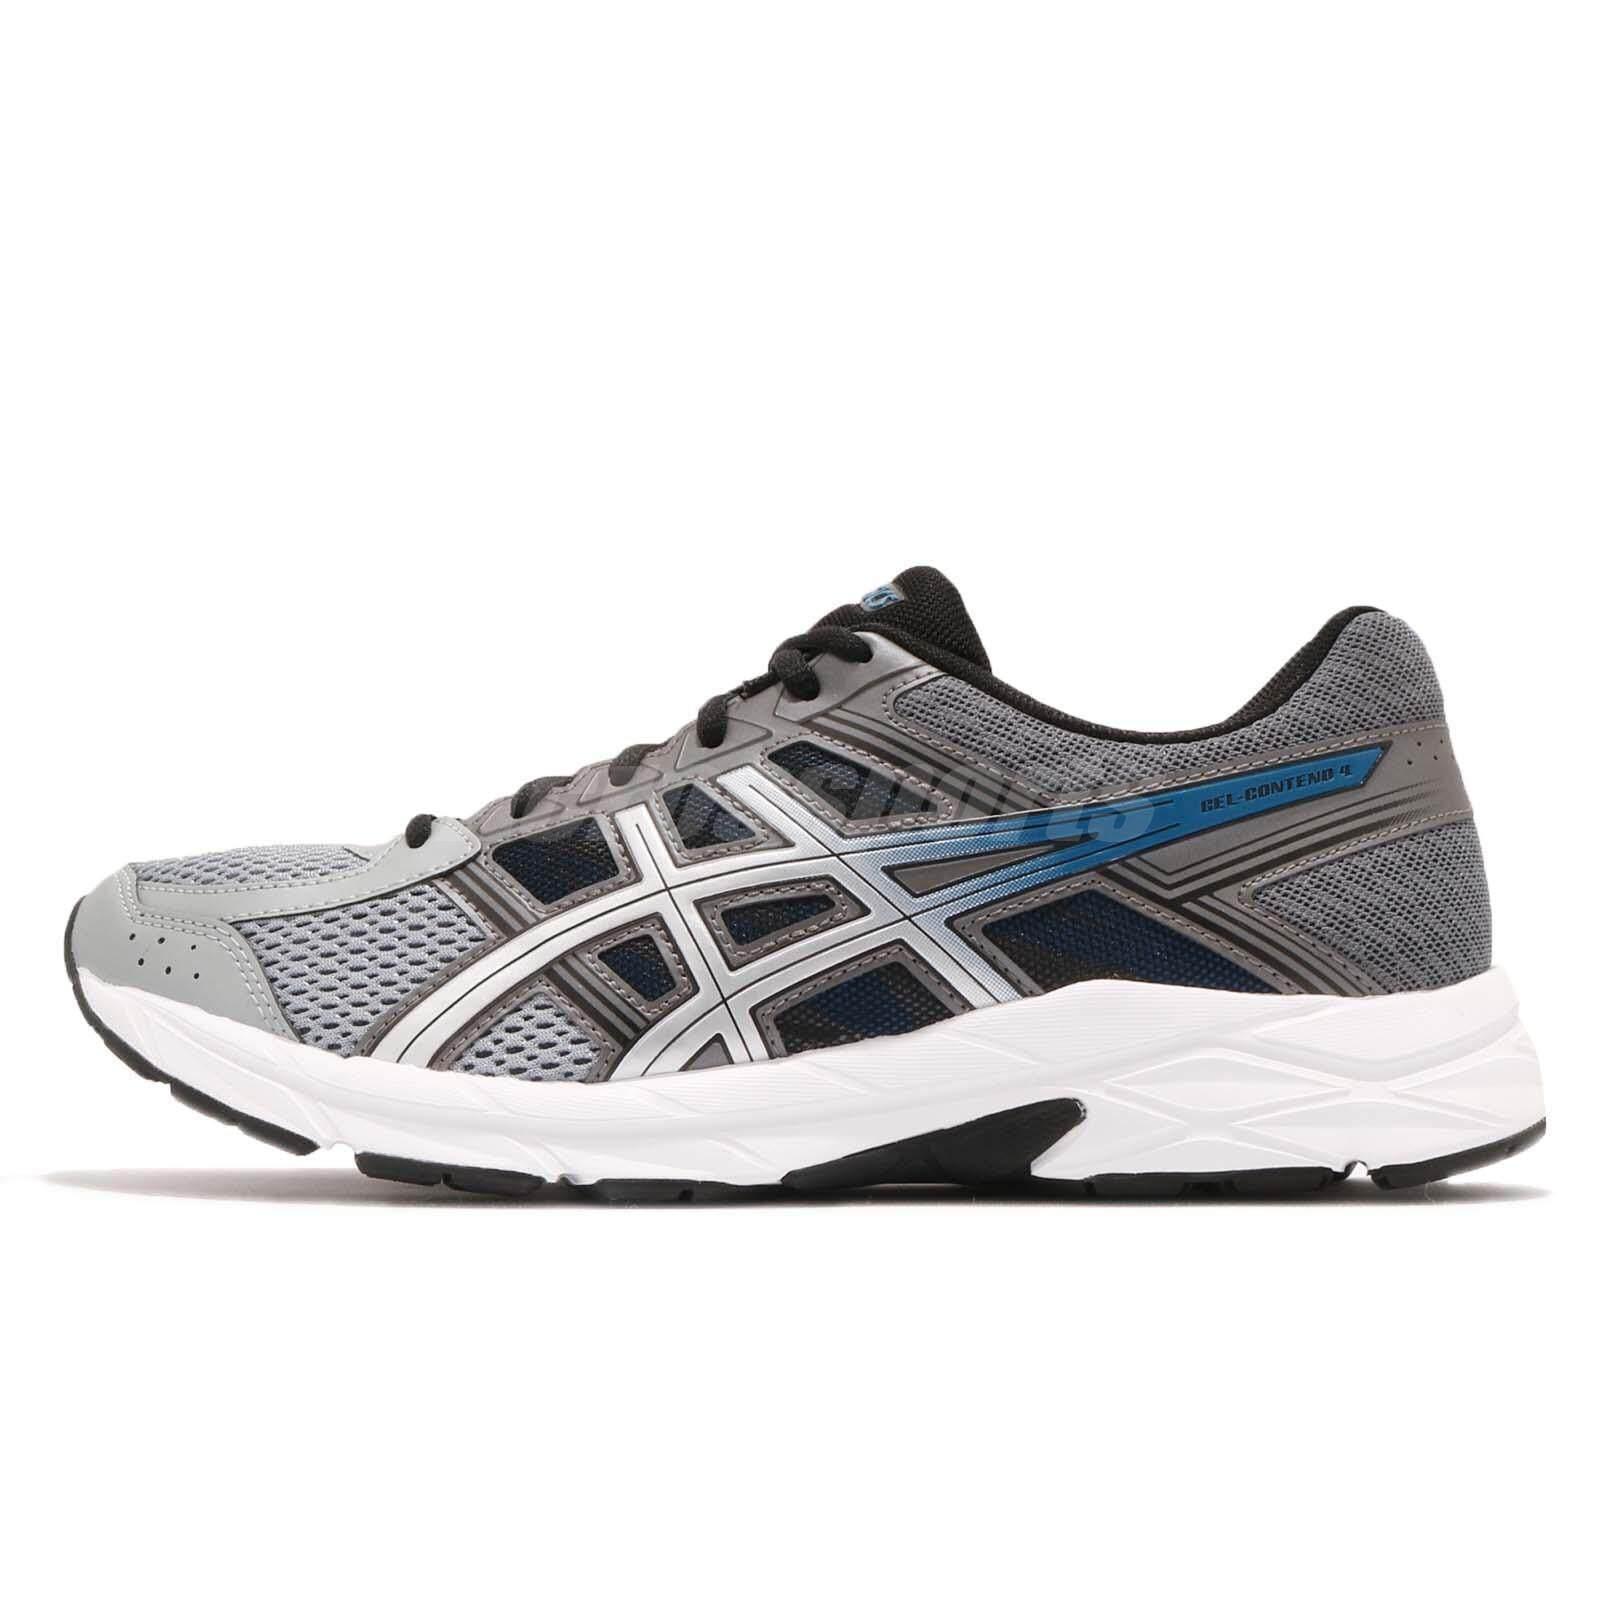 designer fashion 702b4 8ee0c Asics Gel-Contend 4 Grey Silver White Men Running Shoes Sneakers